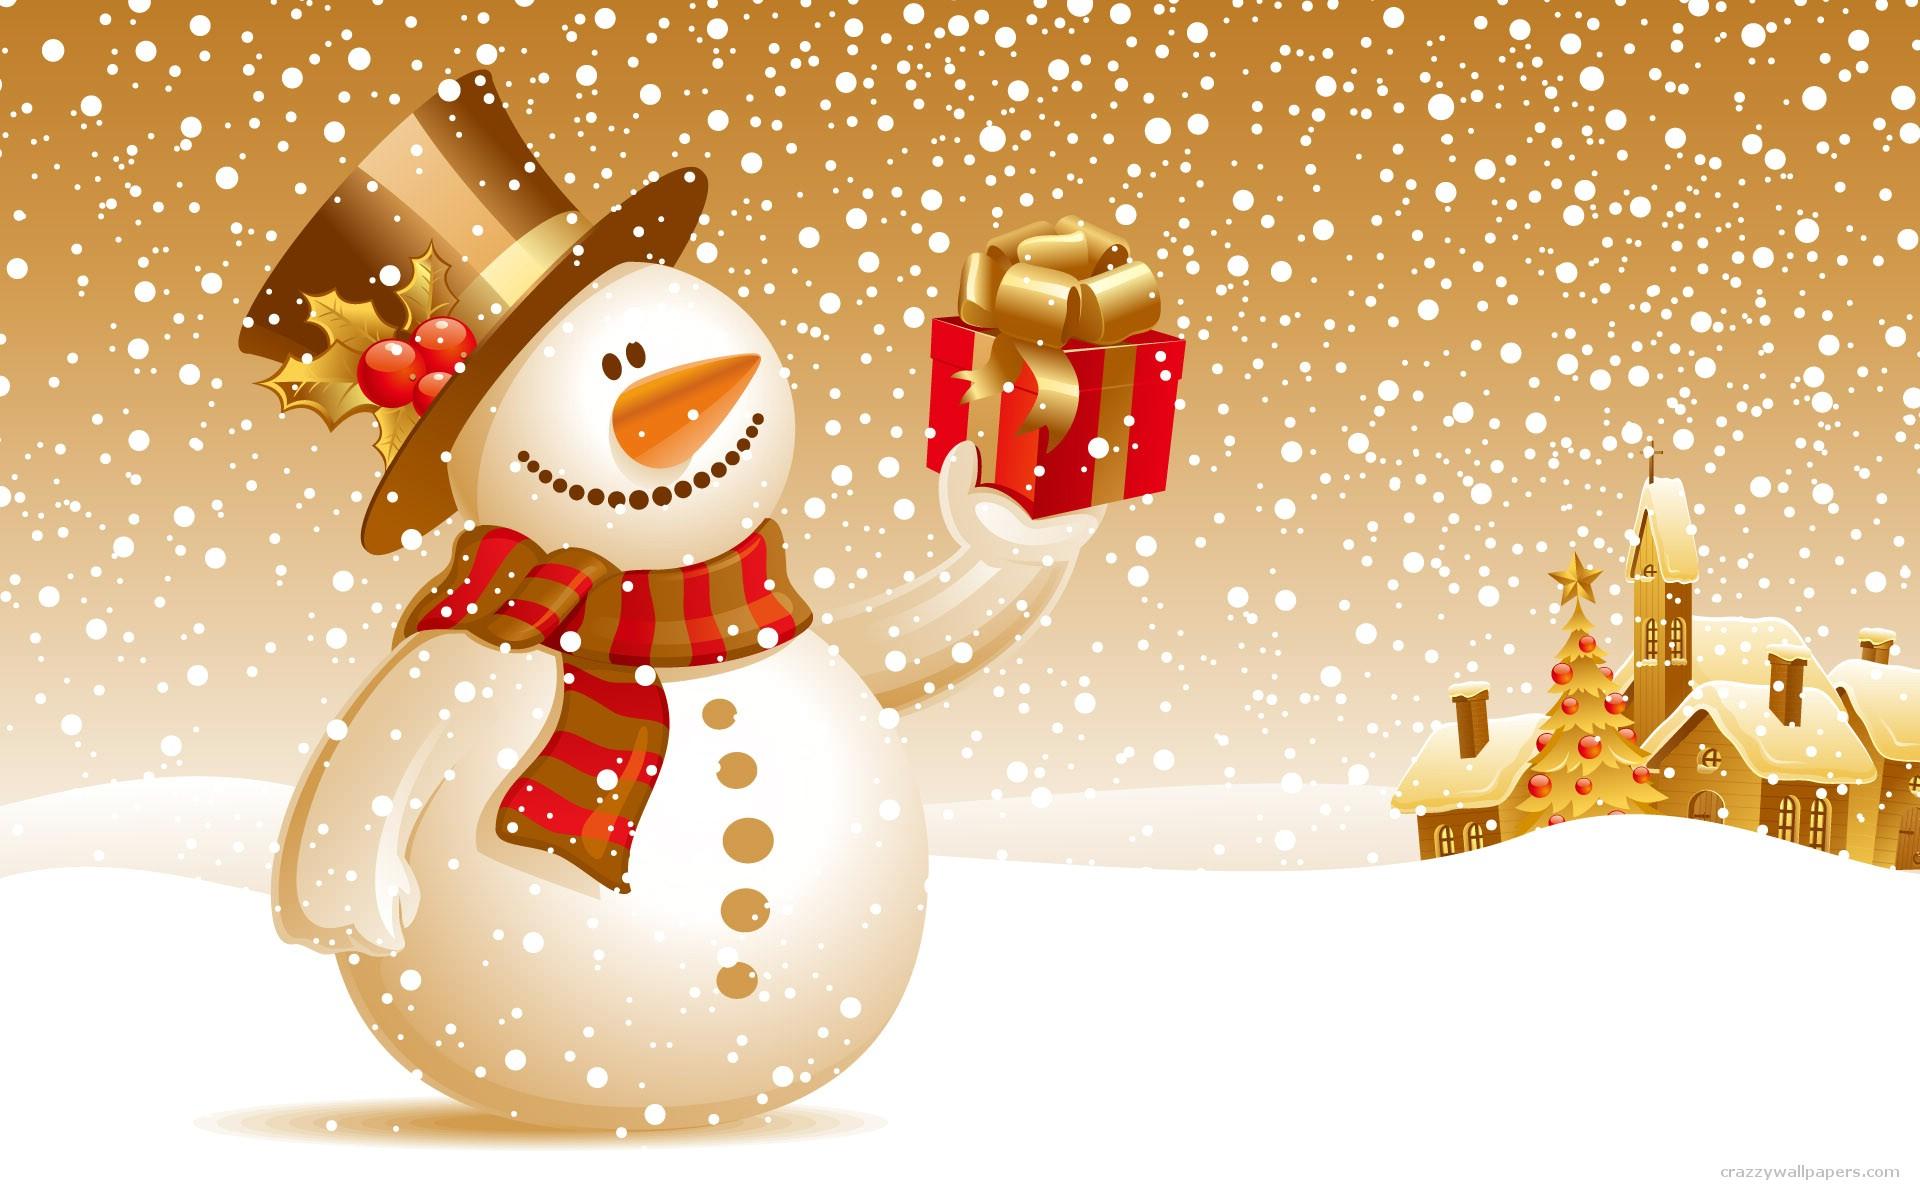 Dibujo de muñeco de las nieves - 1920x1200